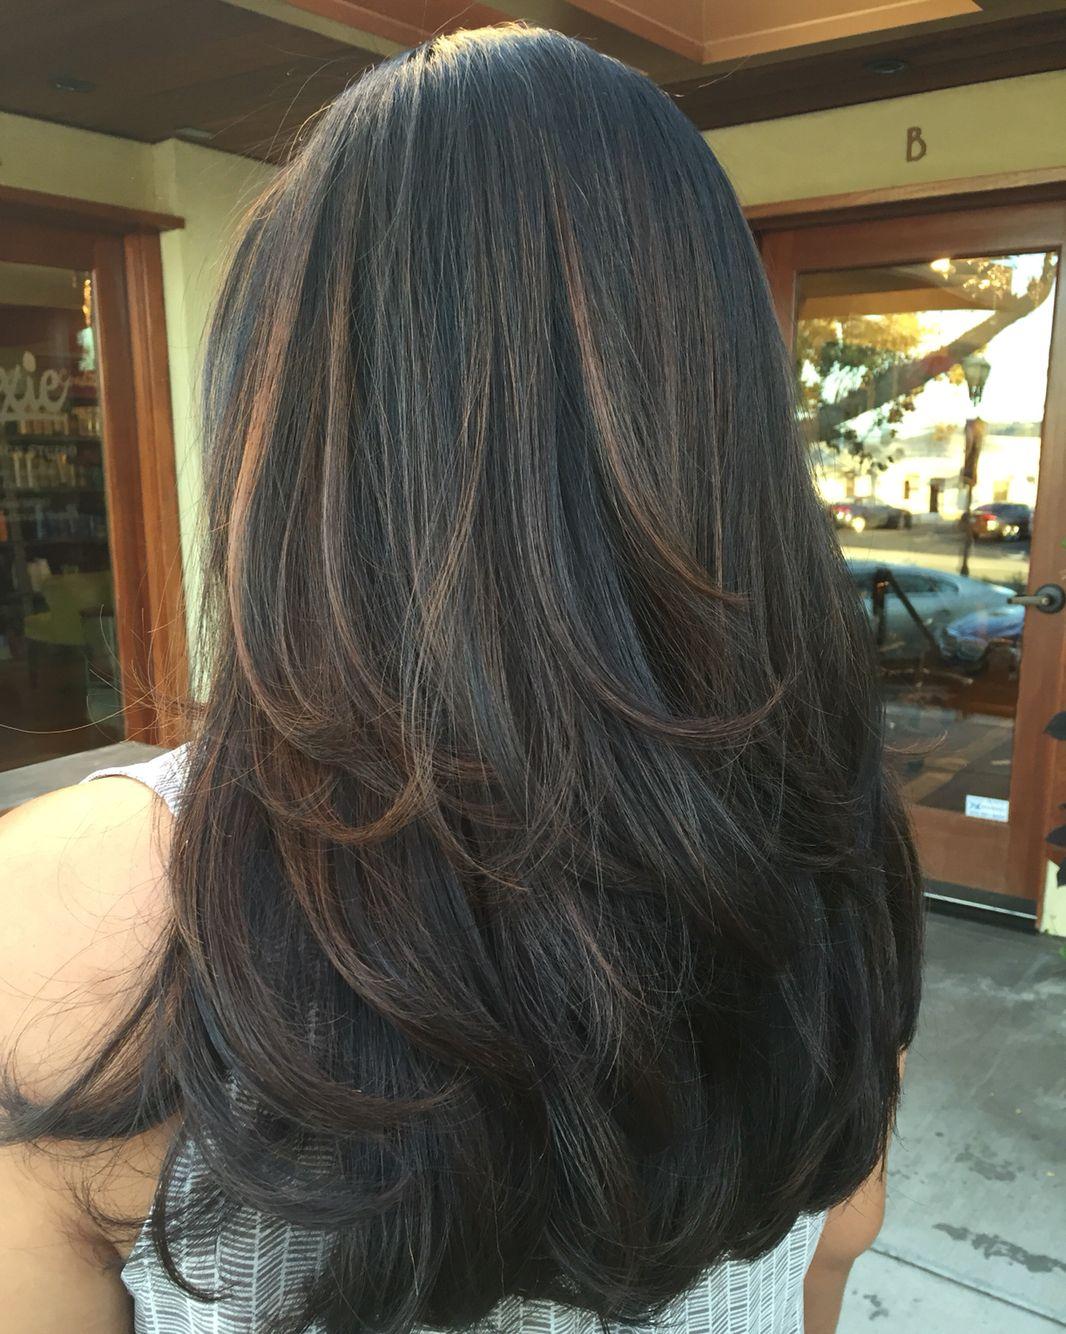 Caramel highlights for fall by amanda scott posh salon hair